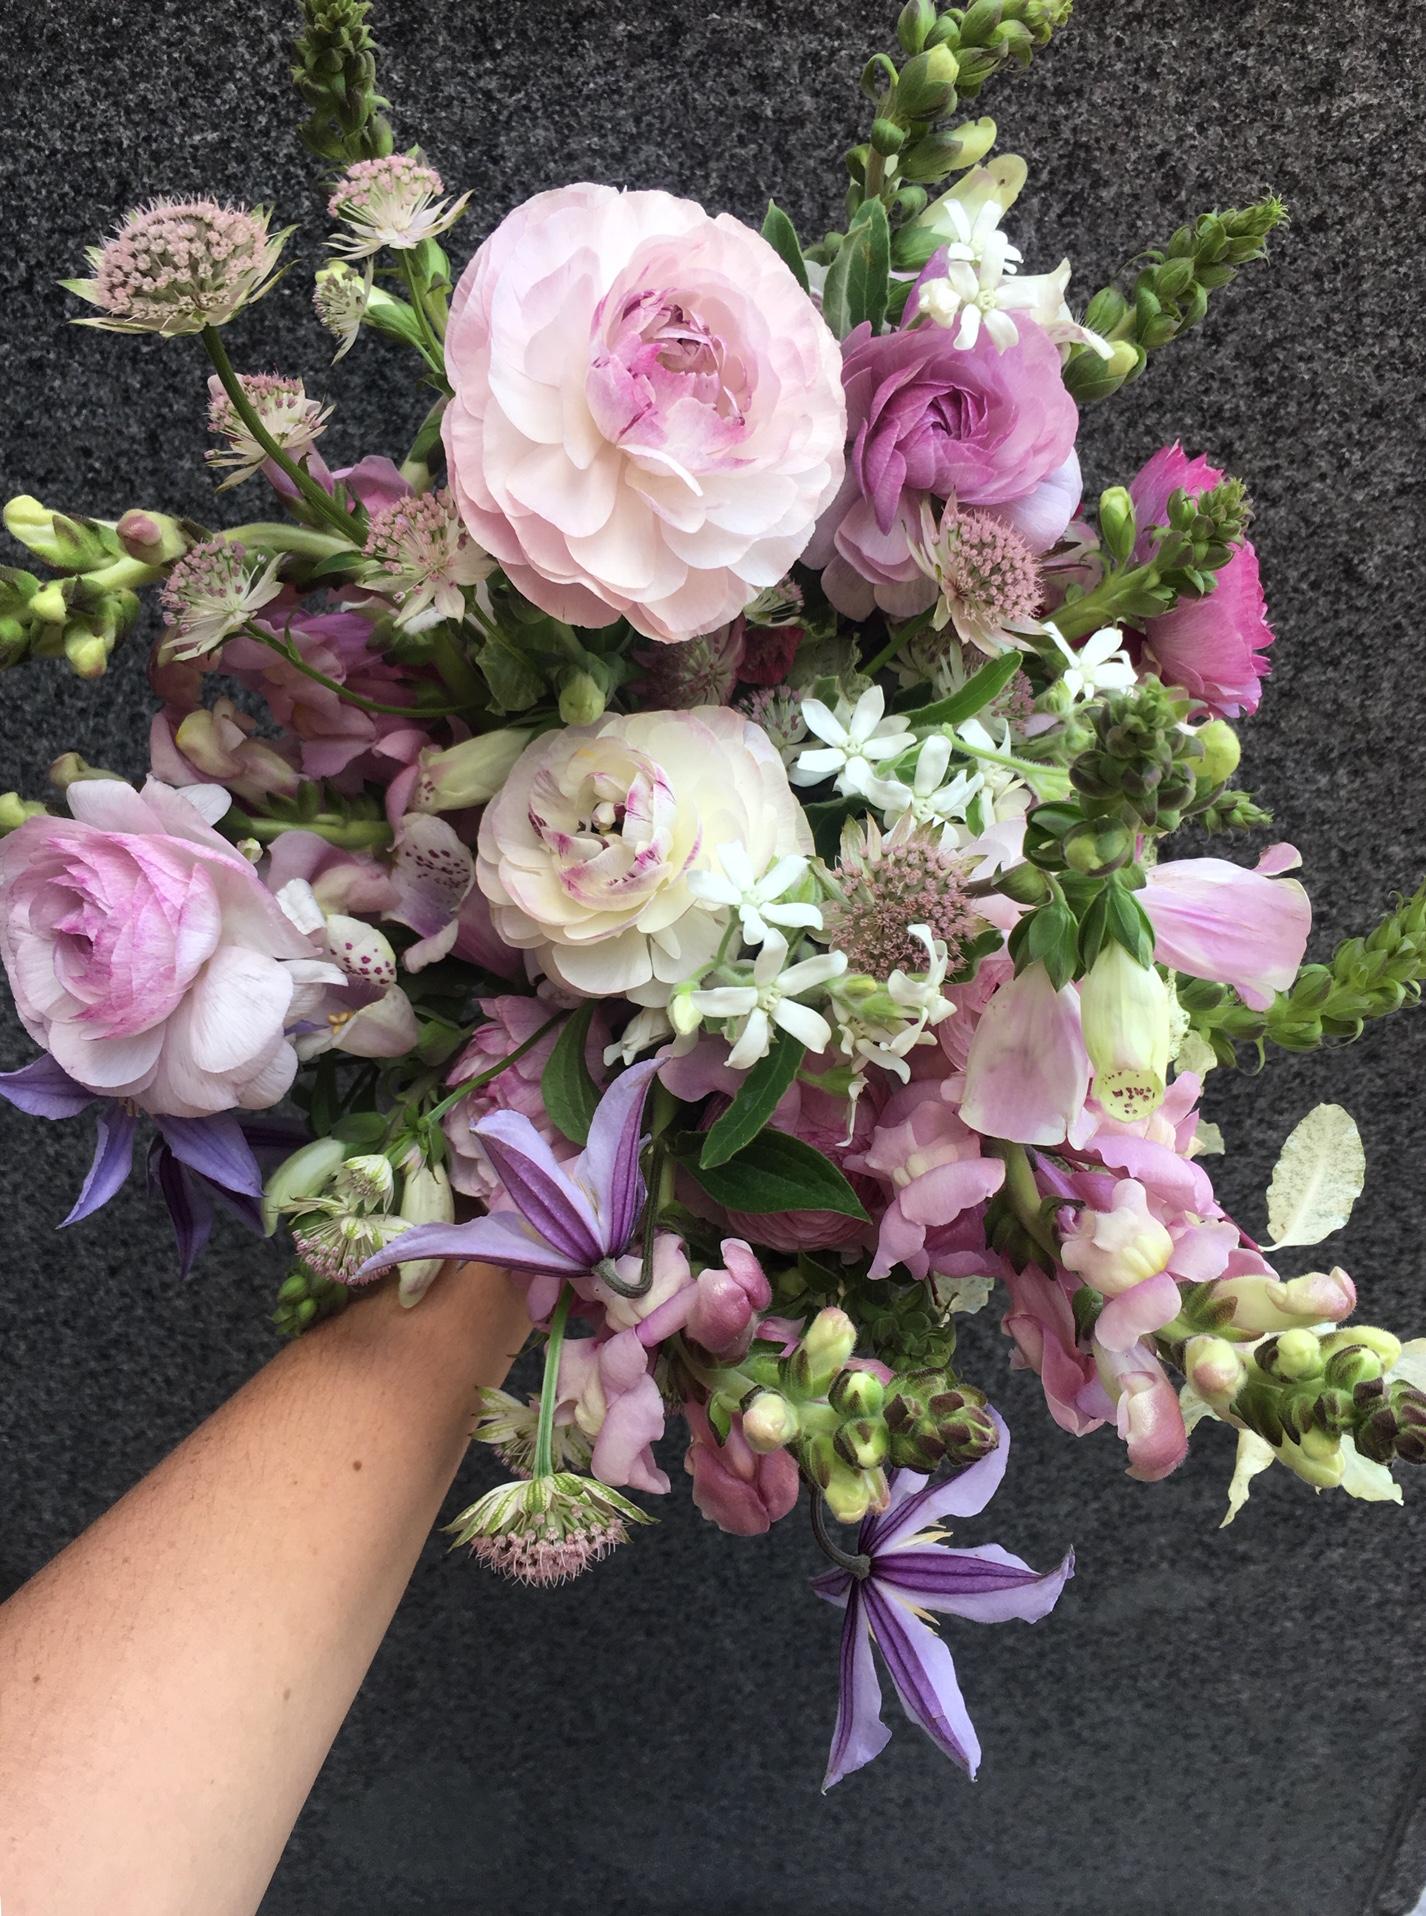 Botanicamuse Suher Haidar Refined Francine Ribeau Events